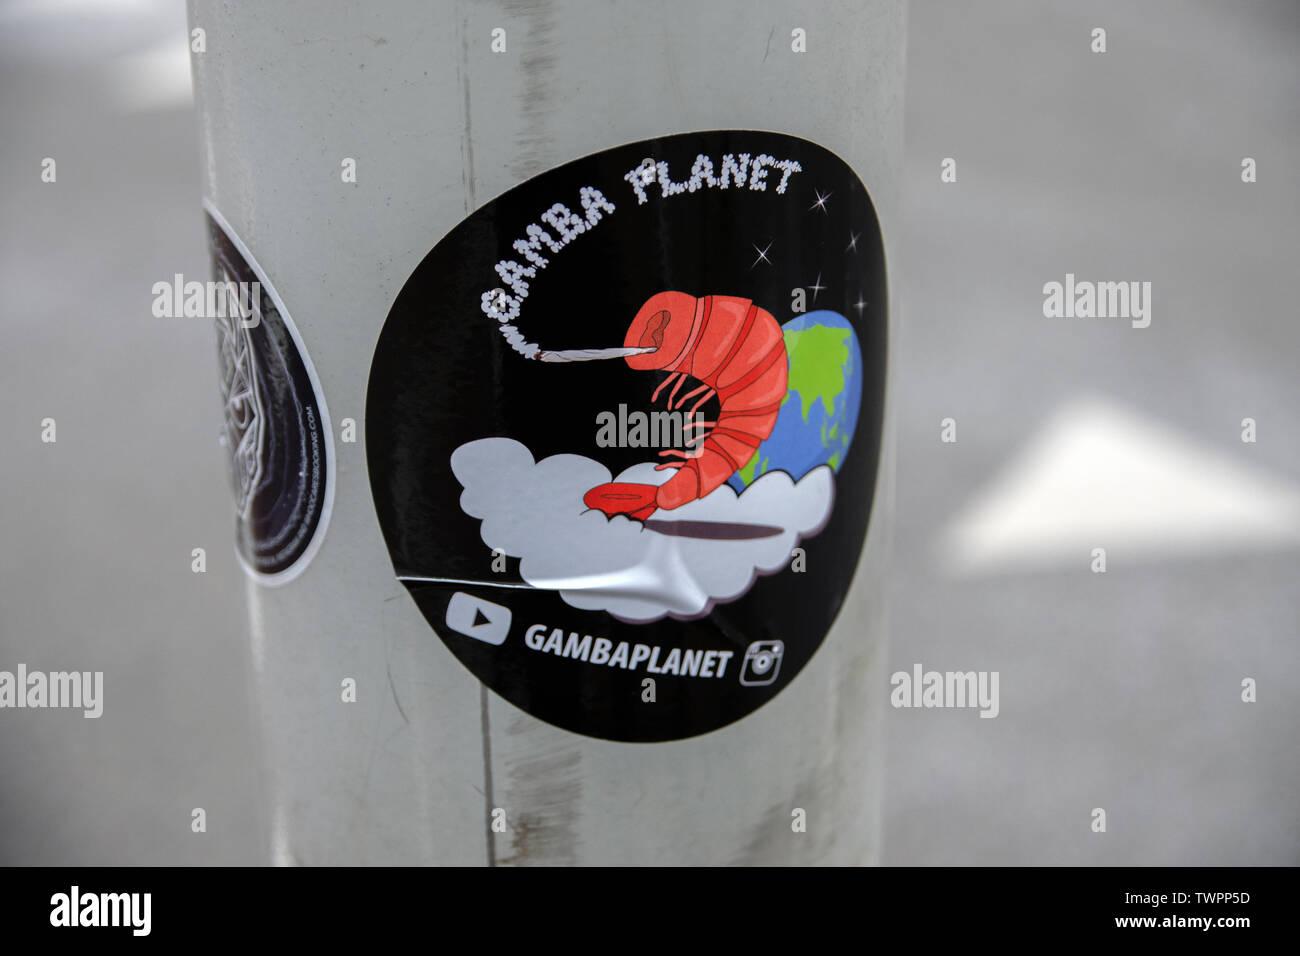 Sticker Gambaplanet At Amsterdam The Netherlands 2019 - Stock Image